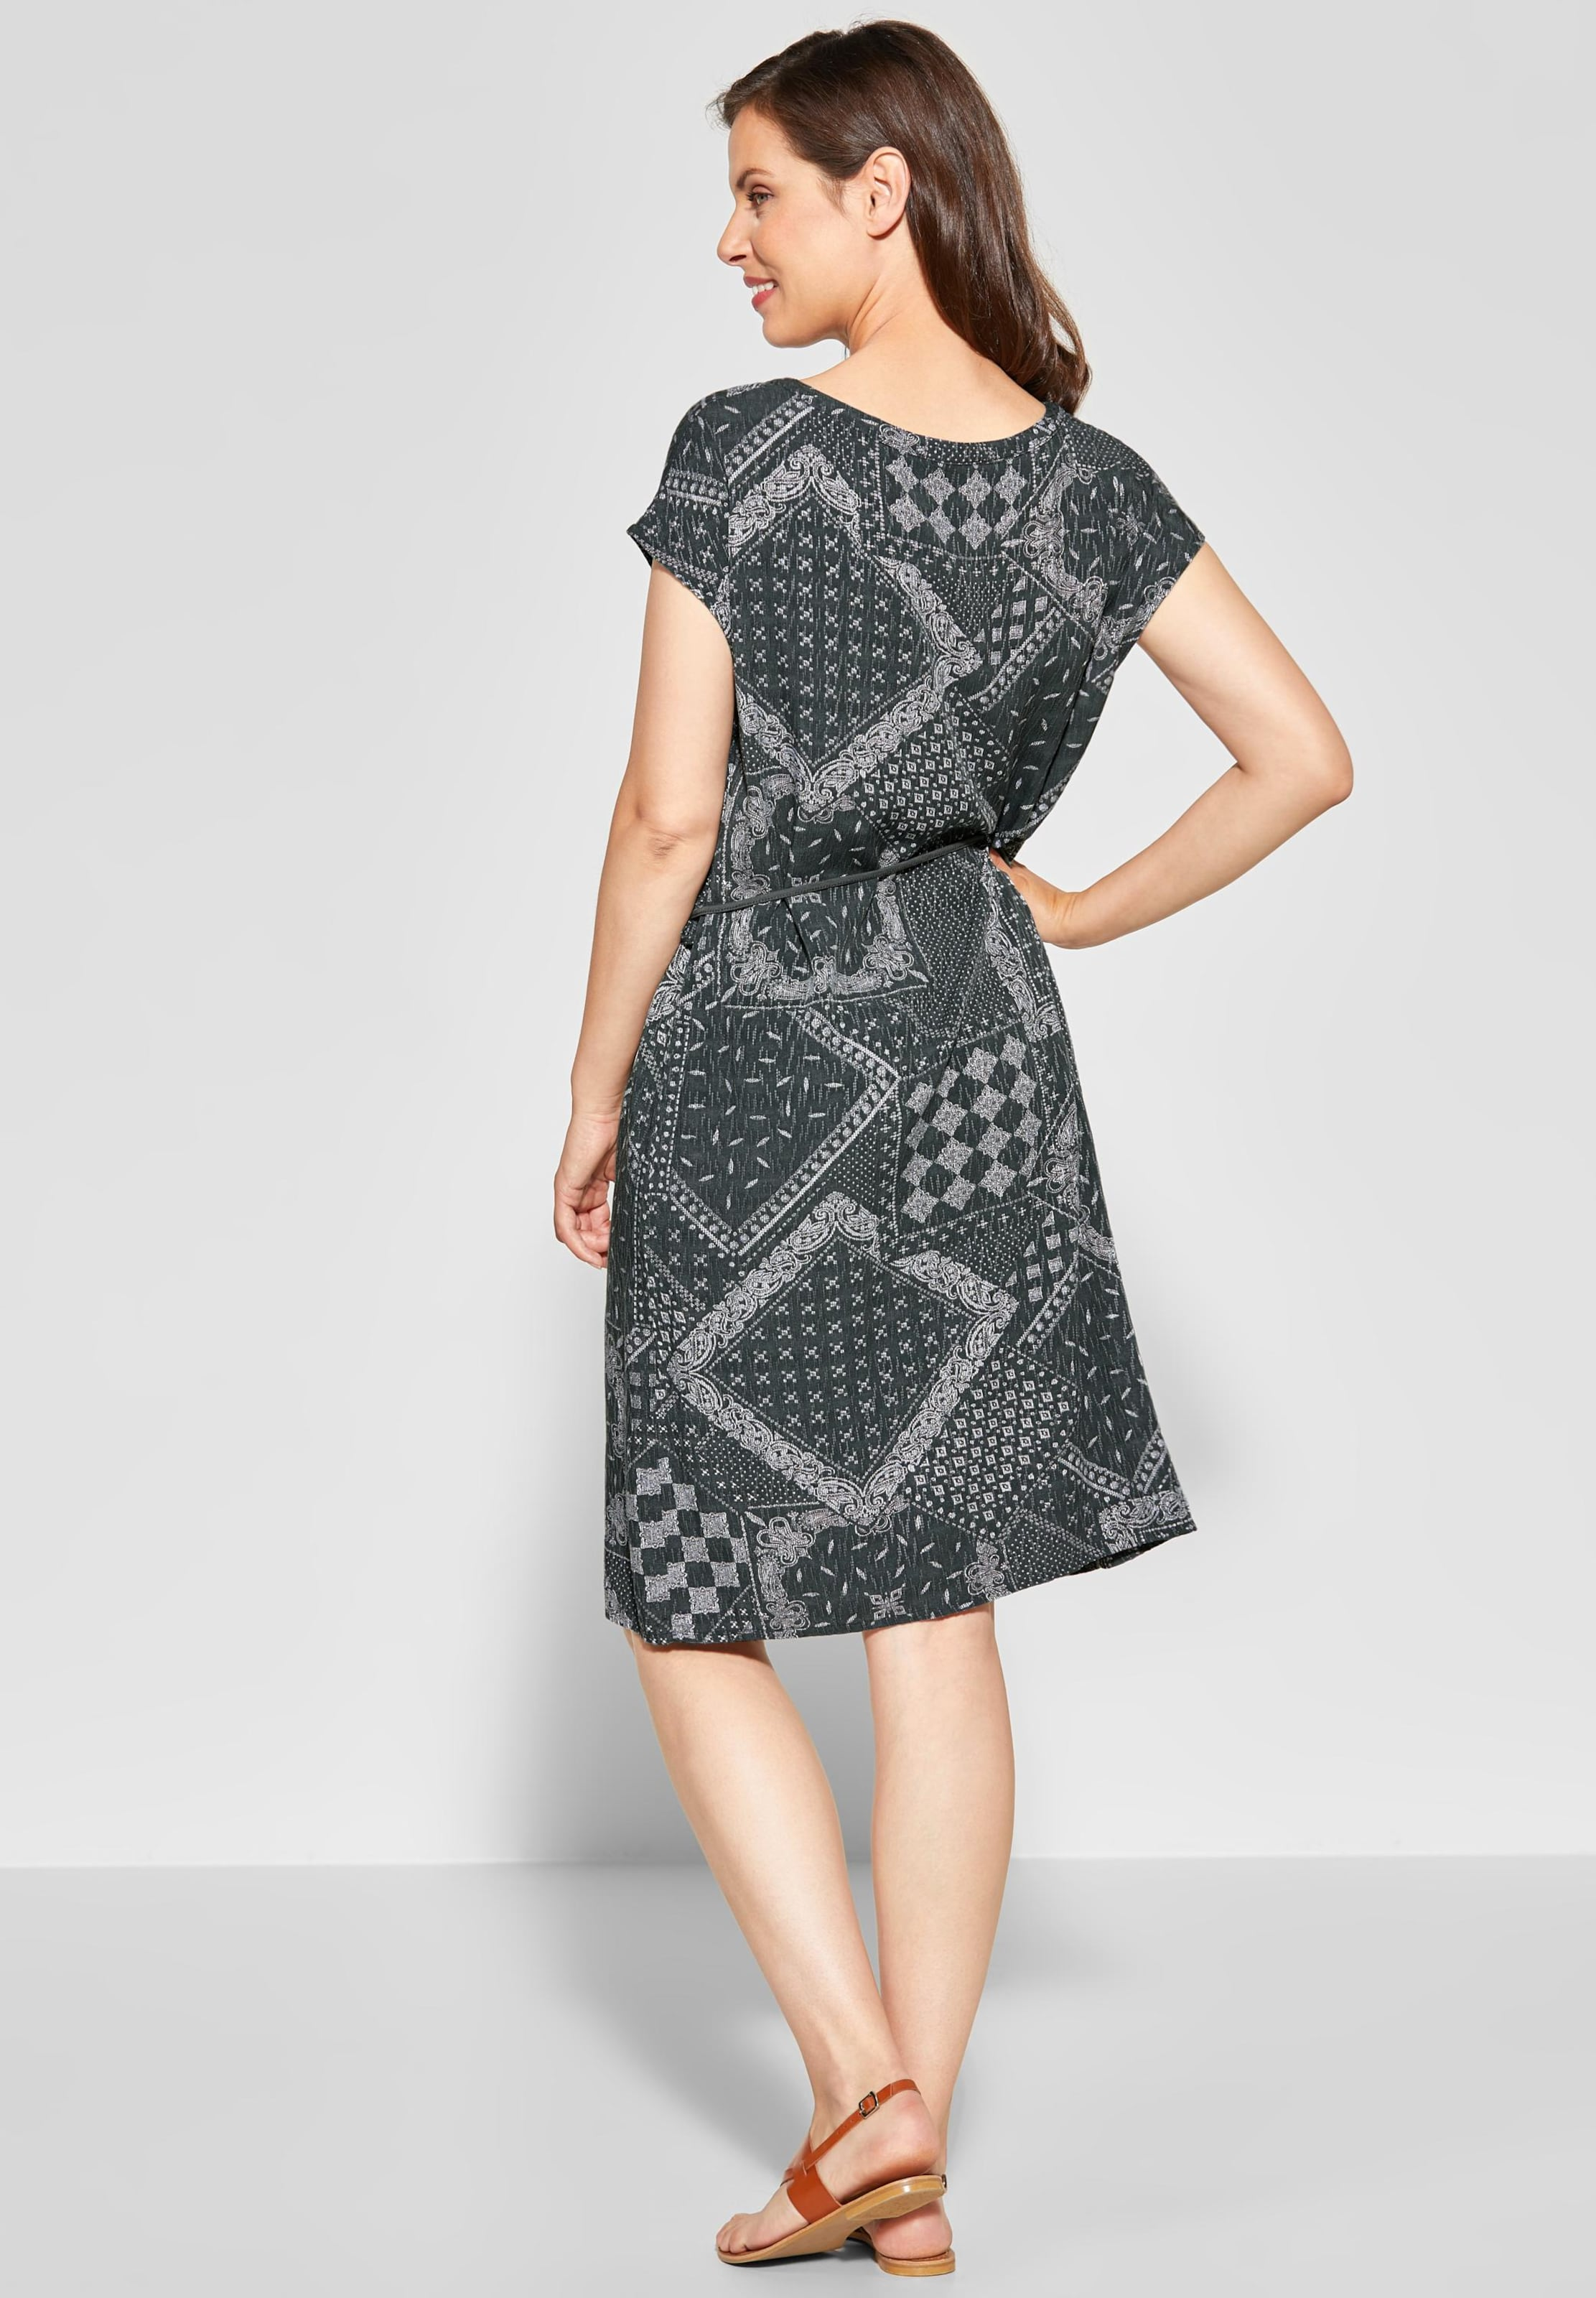 SmaragdWeiß Kleid Kleid In Cecil Cecil QBEdxoWrCe